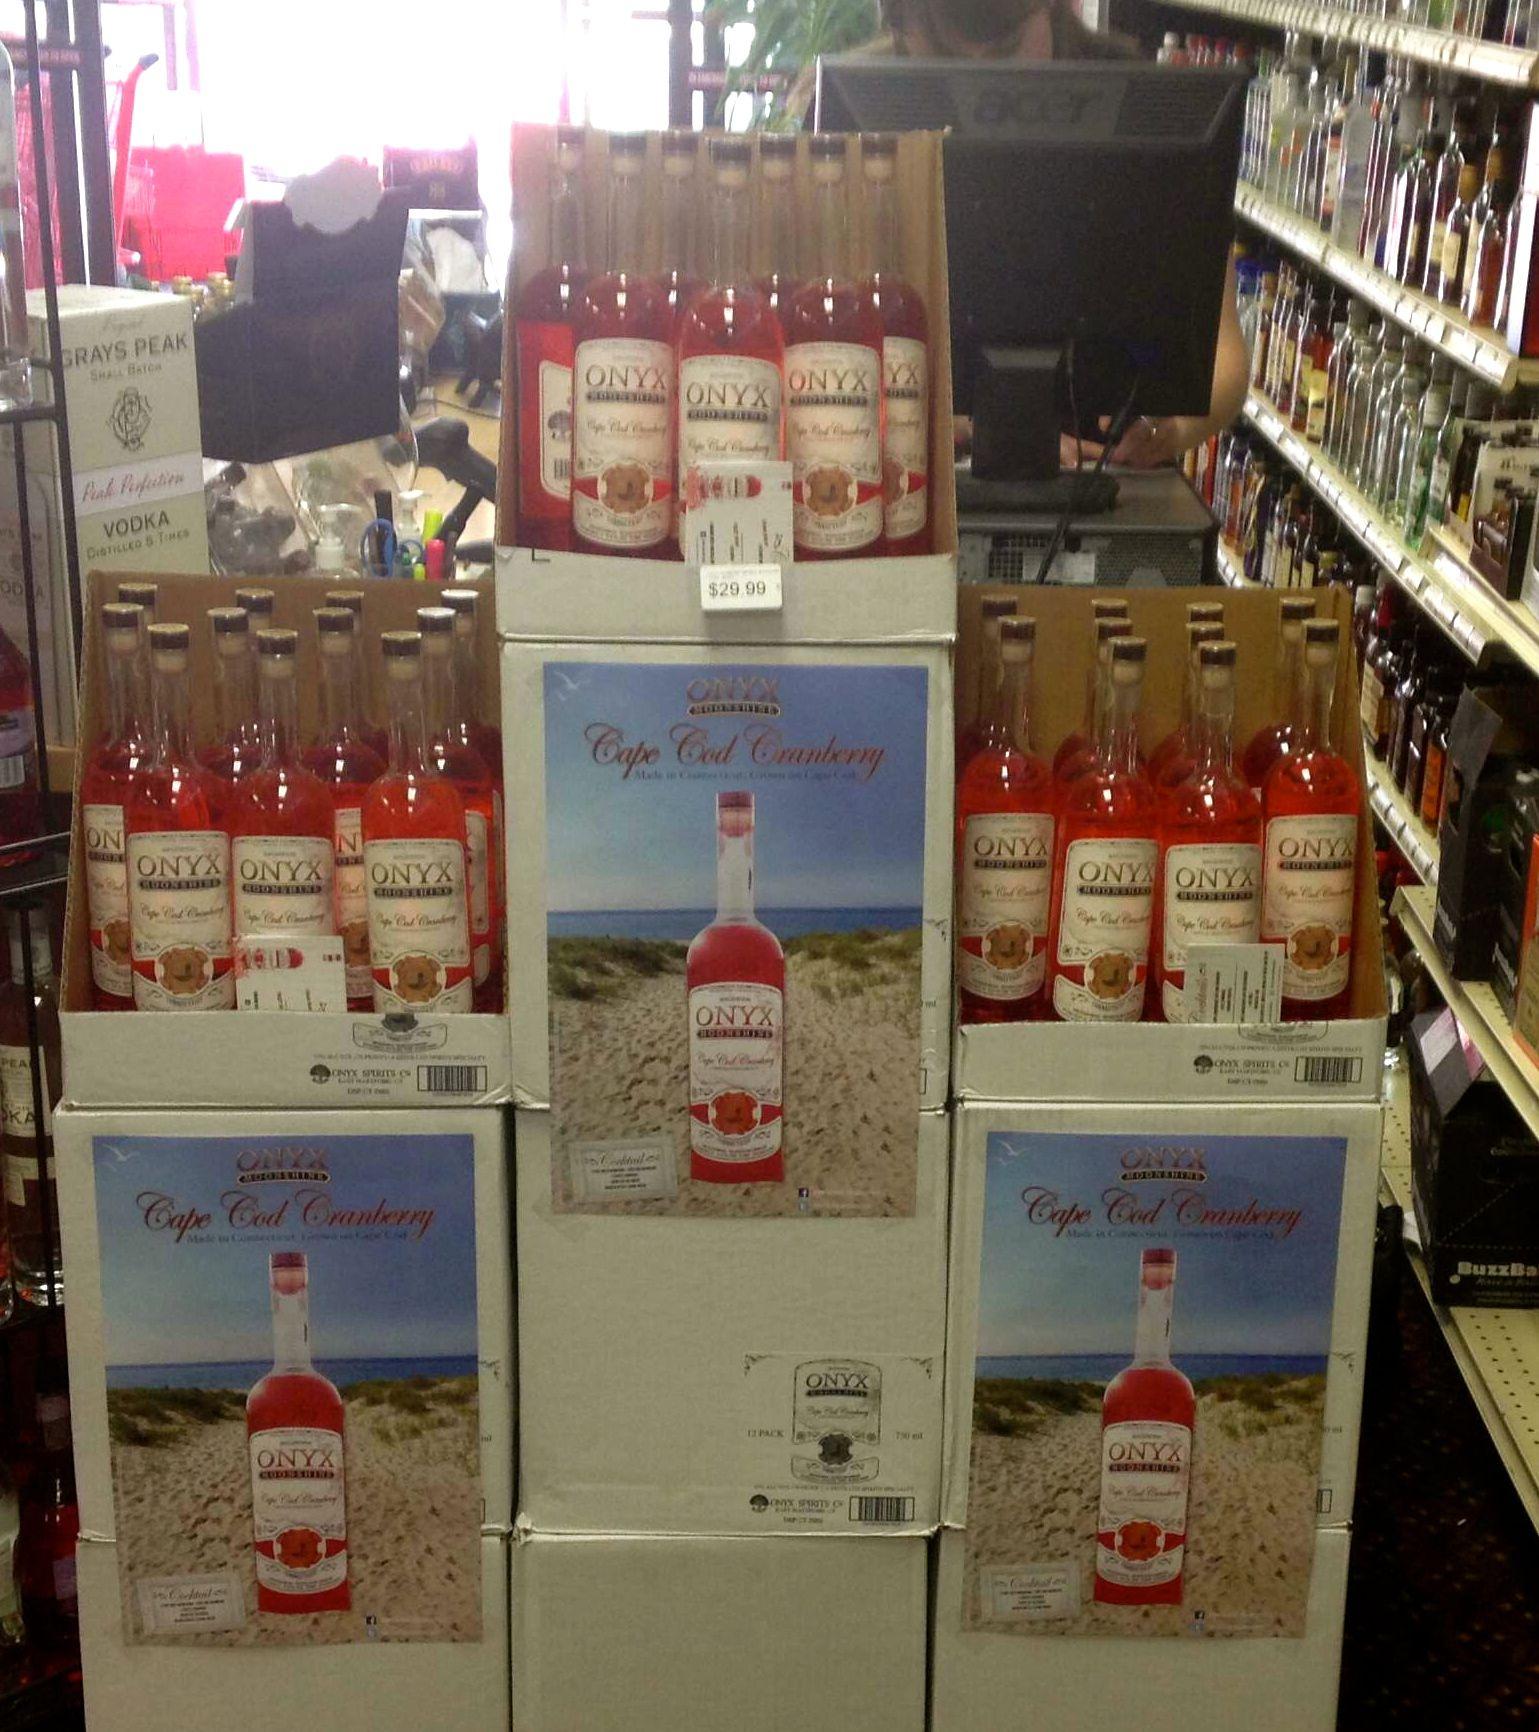 Liquor Store Display Cape Cod Cranberry Pinterest